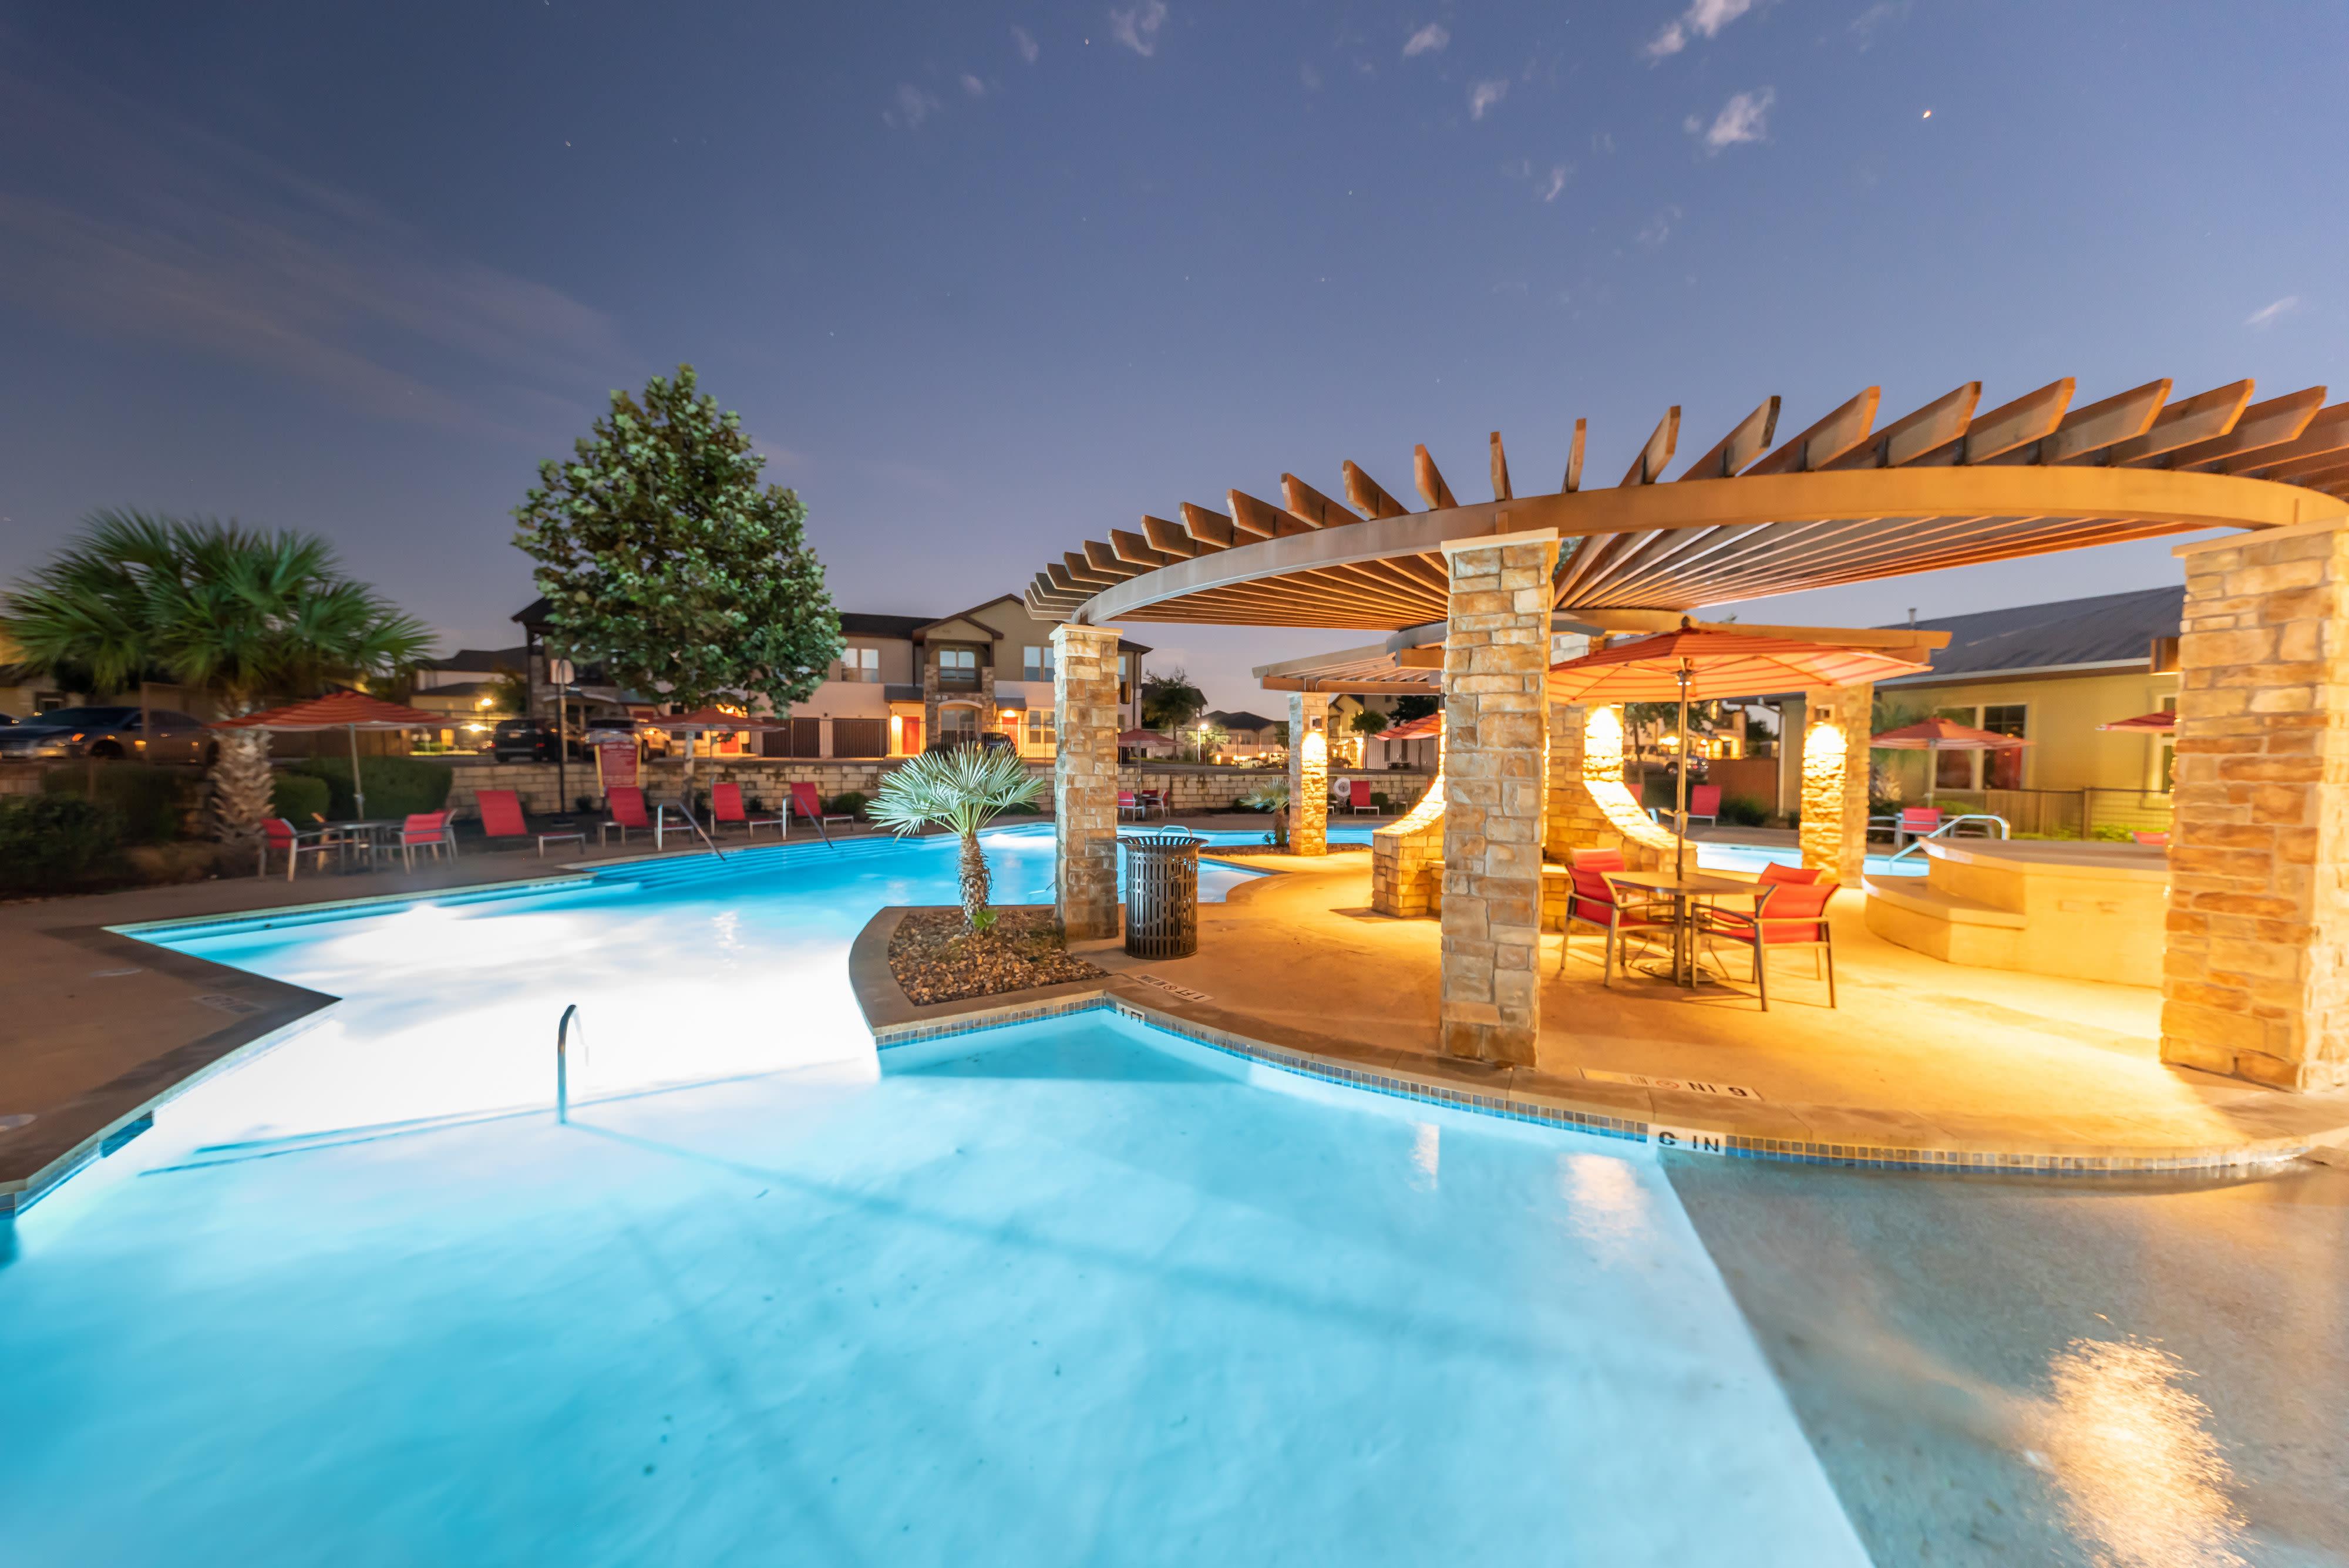 Night time outdoor pool display at Firewheel Apartments in San Antonio